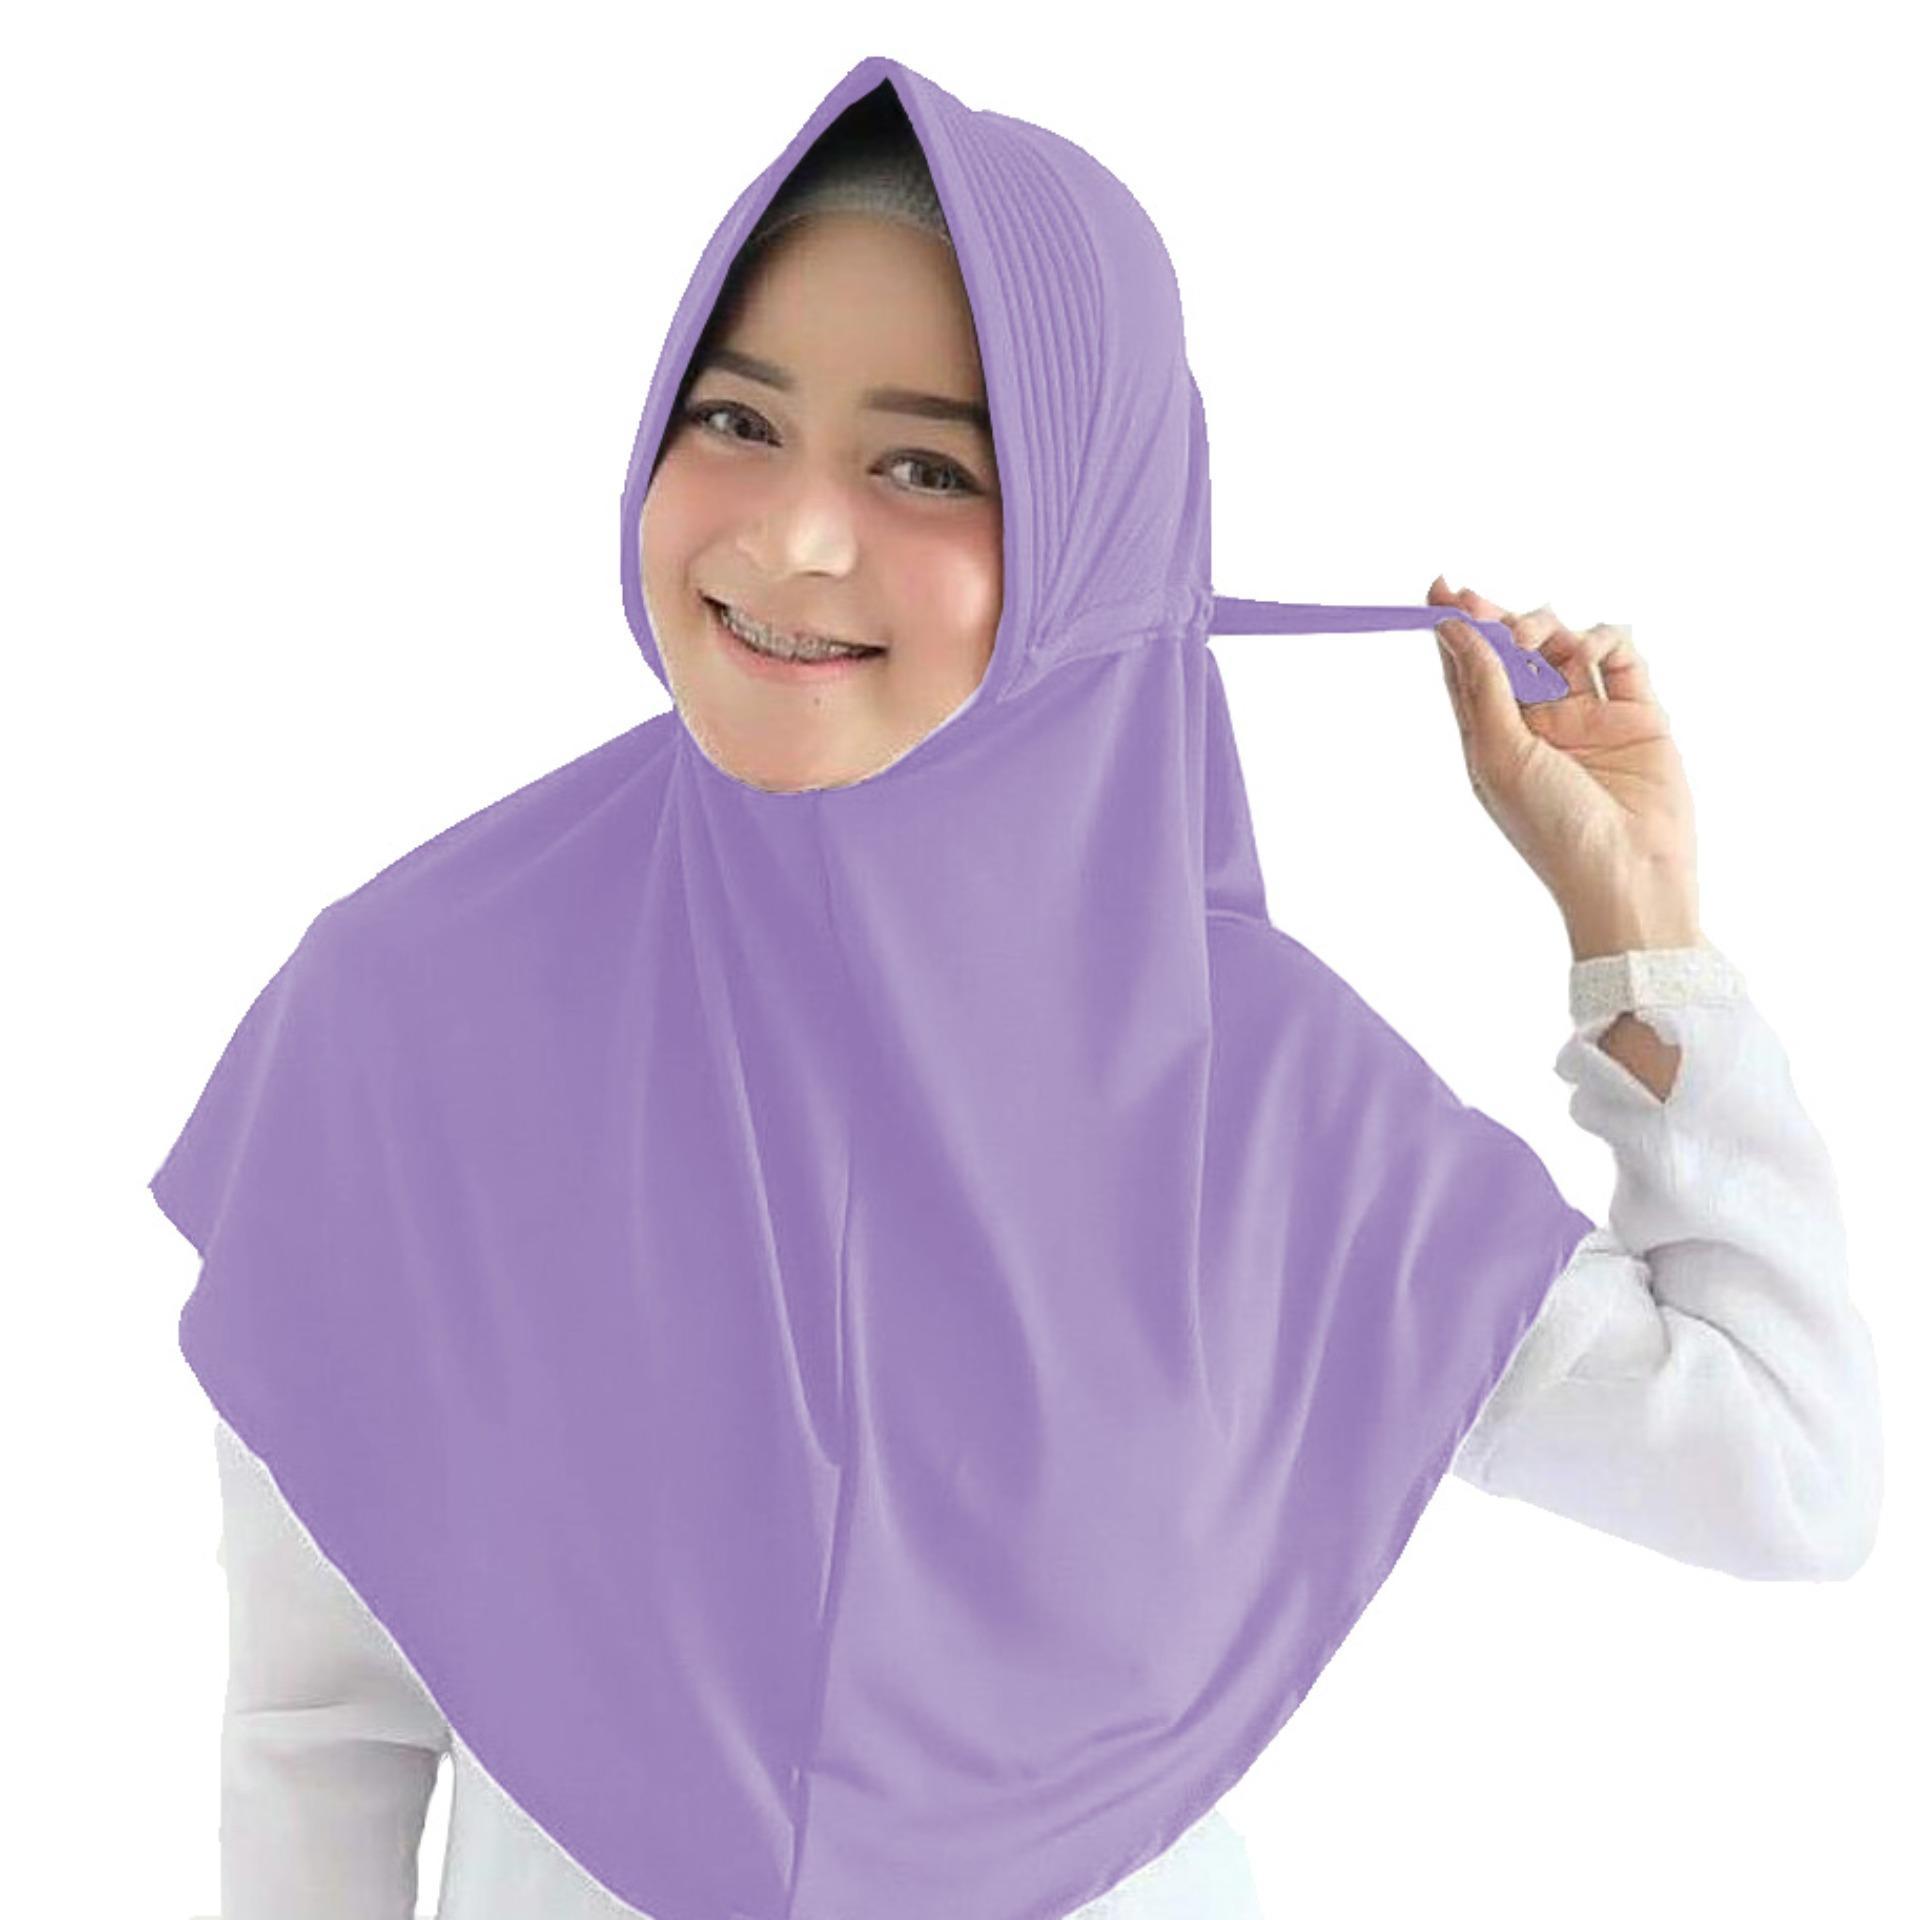 Maula Hijab Jilbab Instan Serut Jokowi Jersey Kerudung instan jilbab khimar